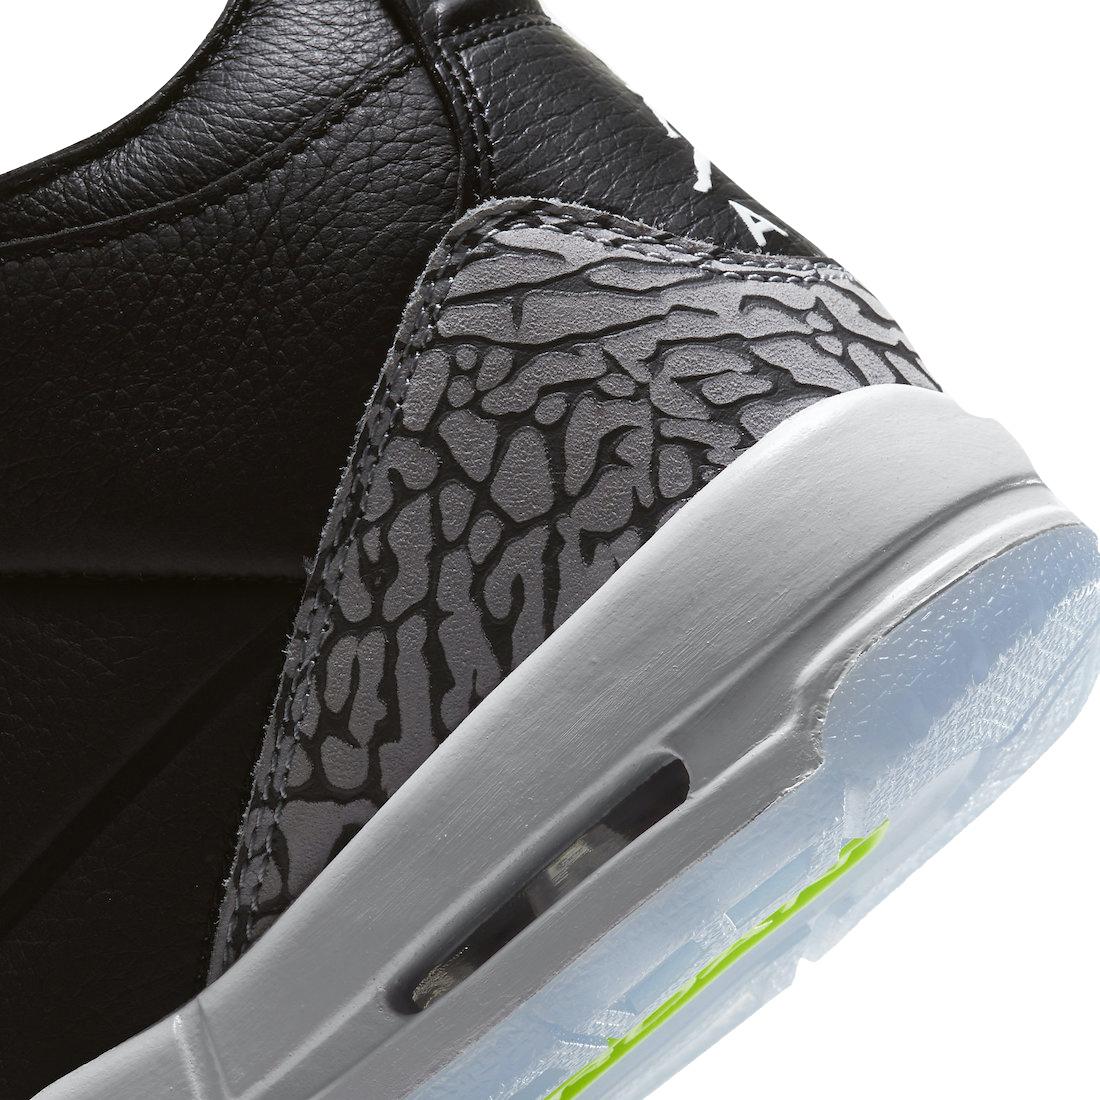 Air Jordan 3 Gs Electric Green